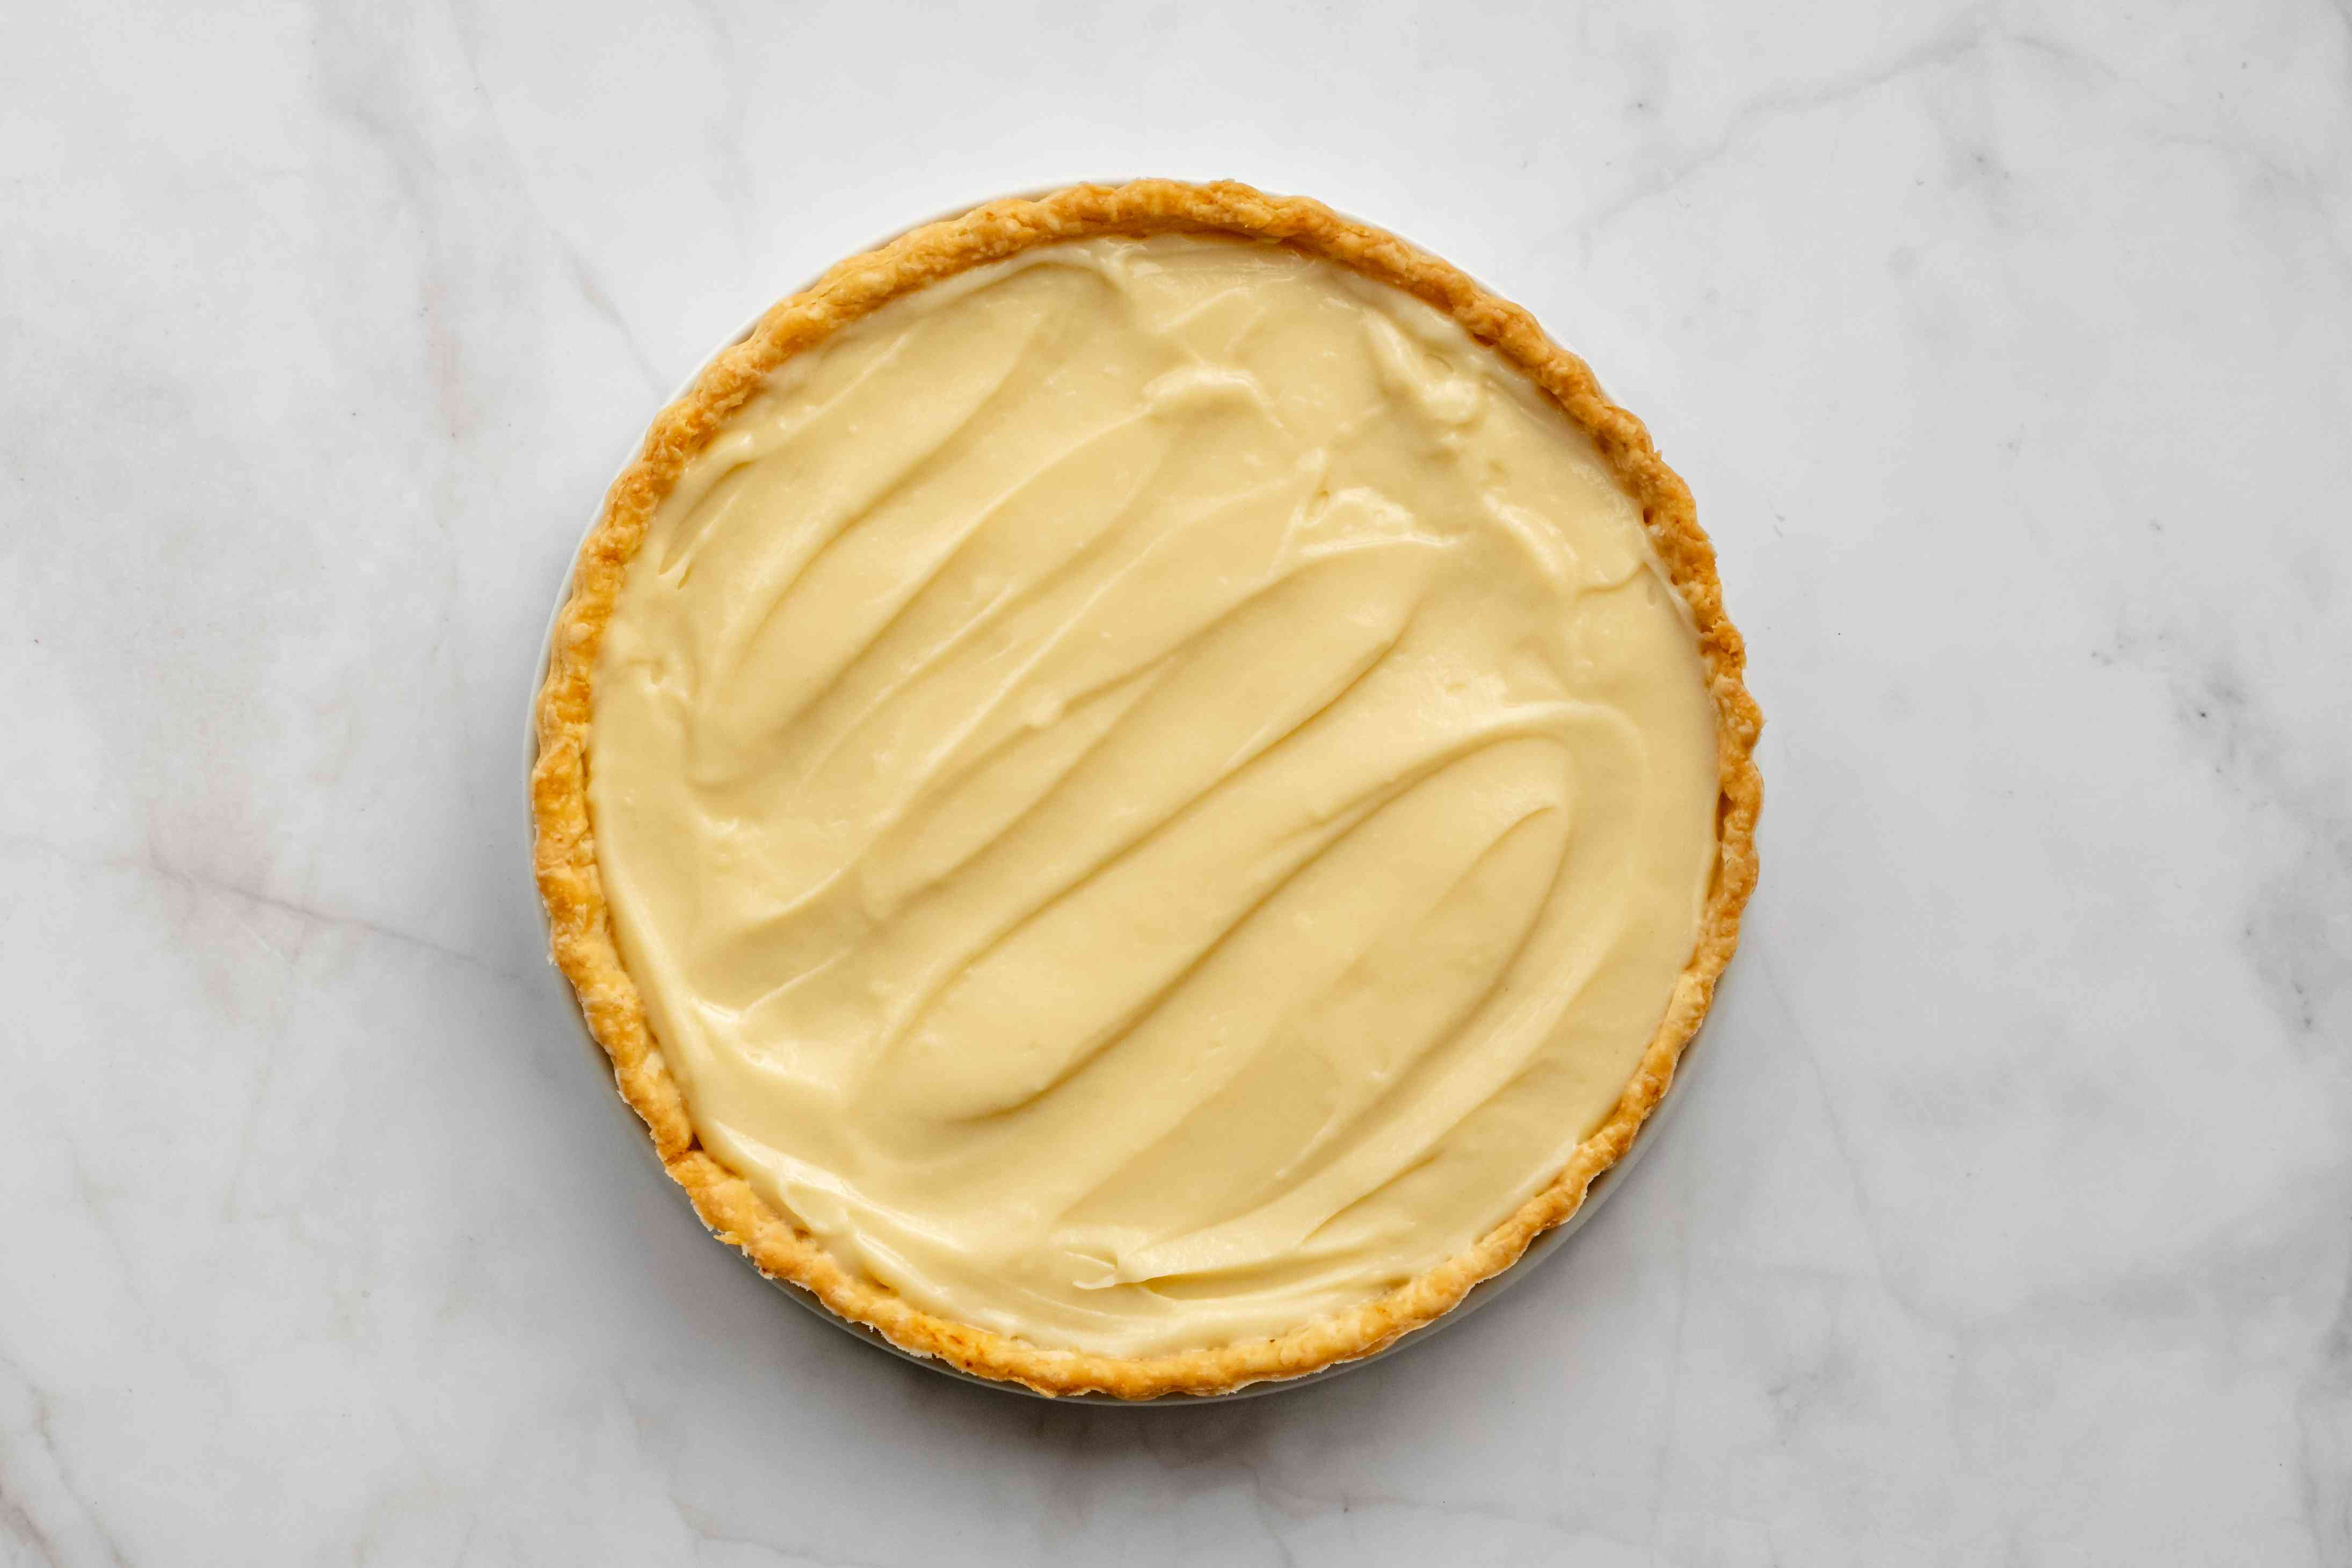 custard inside of tart crust